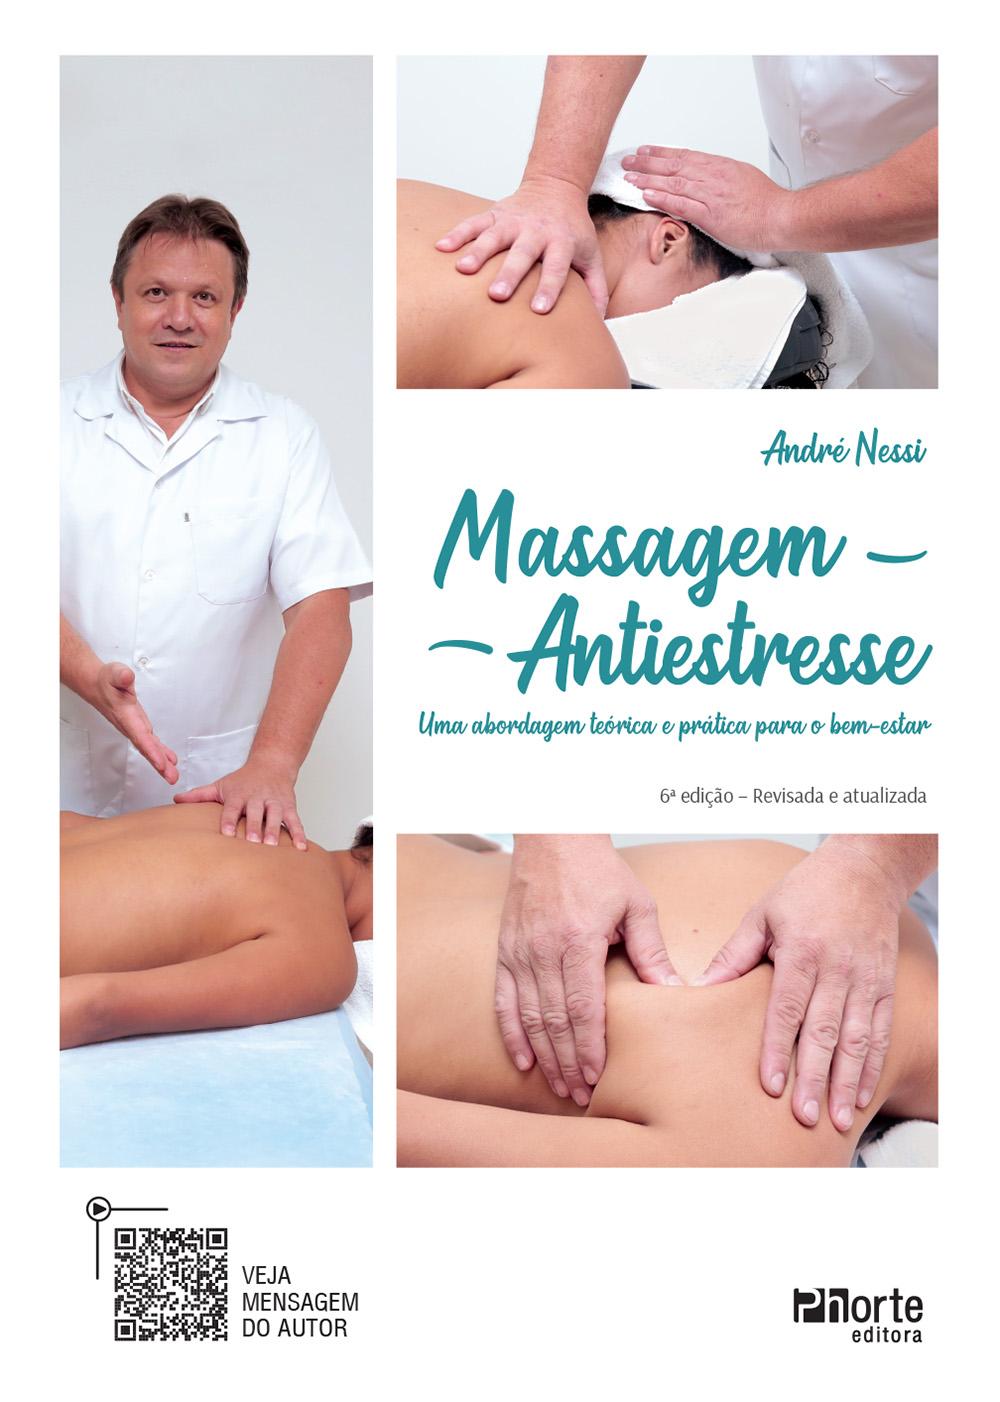 Massagem Antiestresse - 6ª edição ( André Nessi)  - Phorte Editora